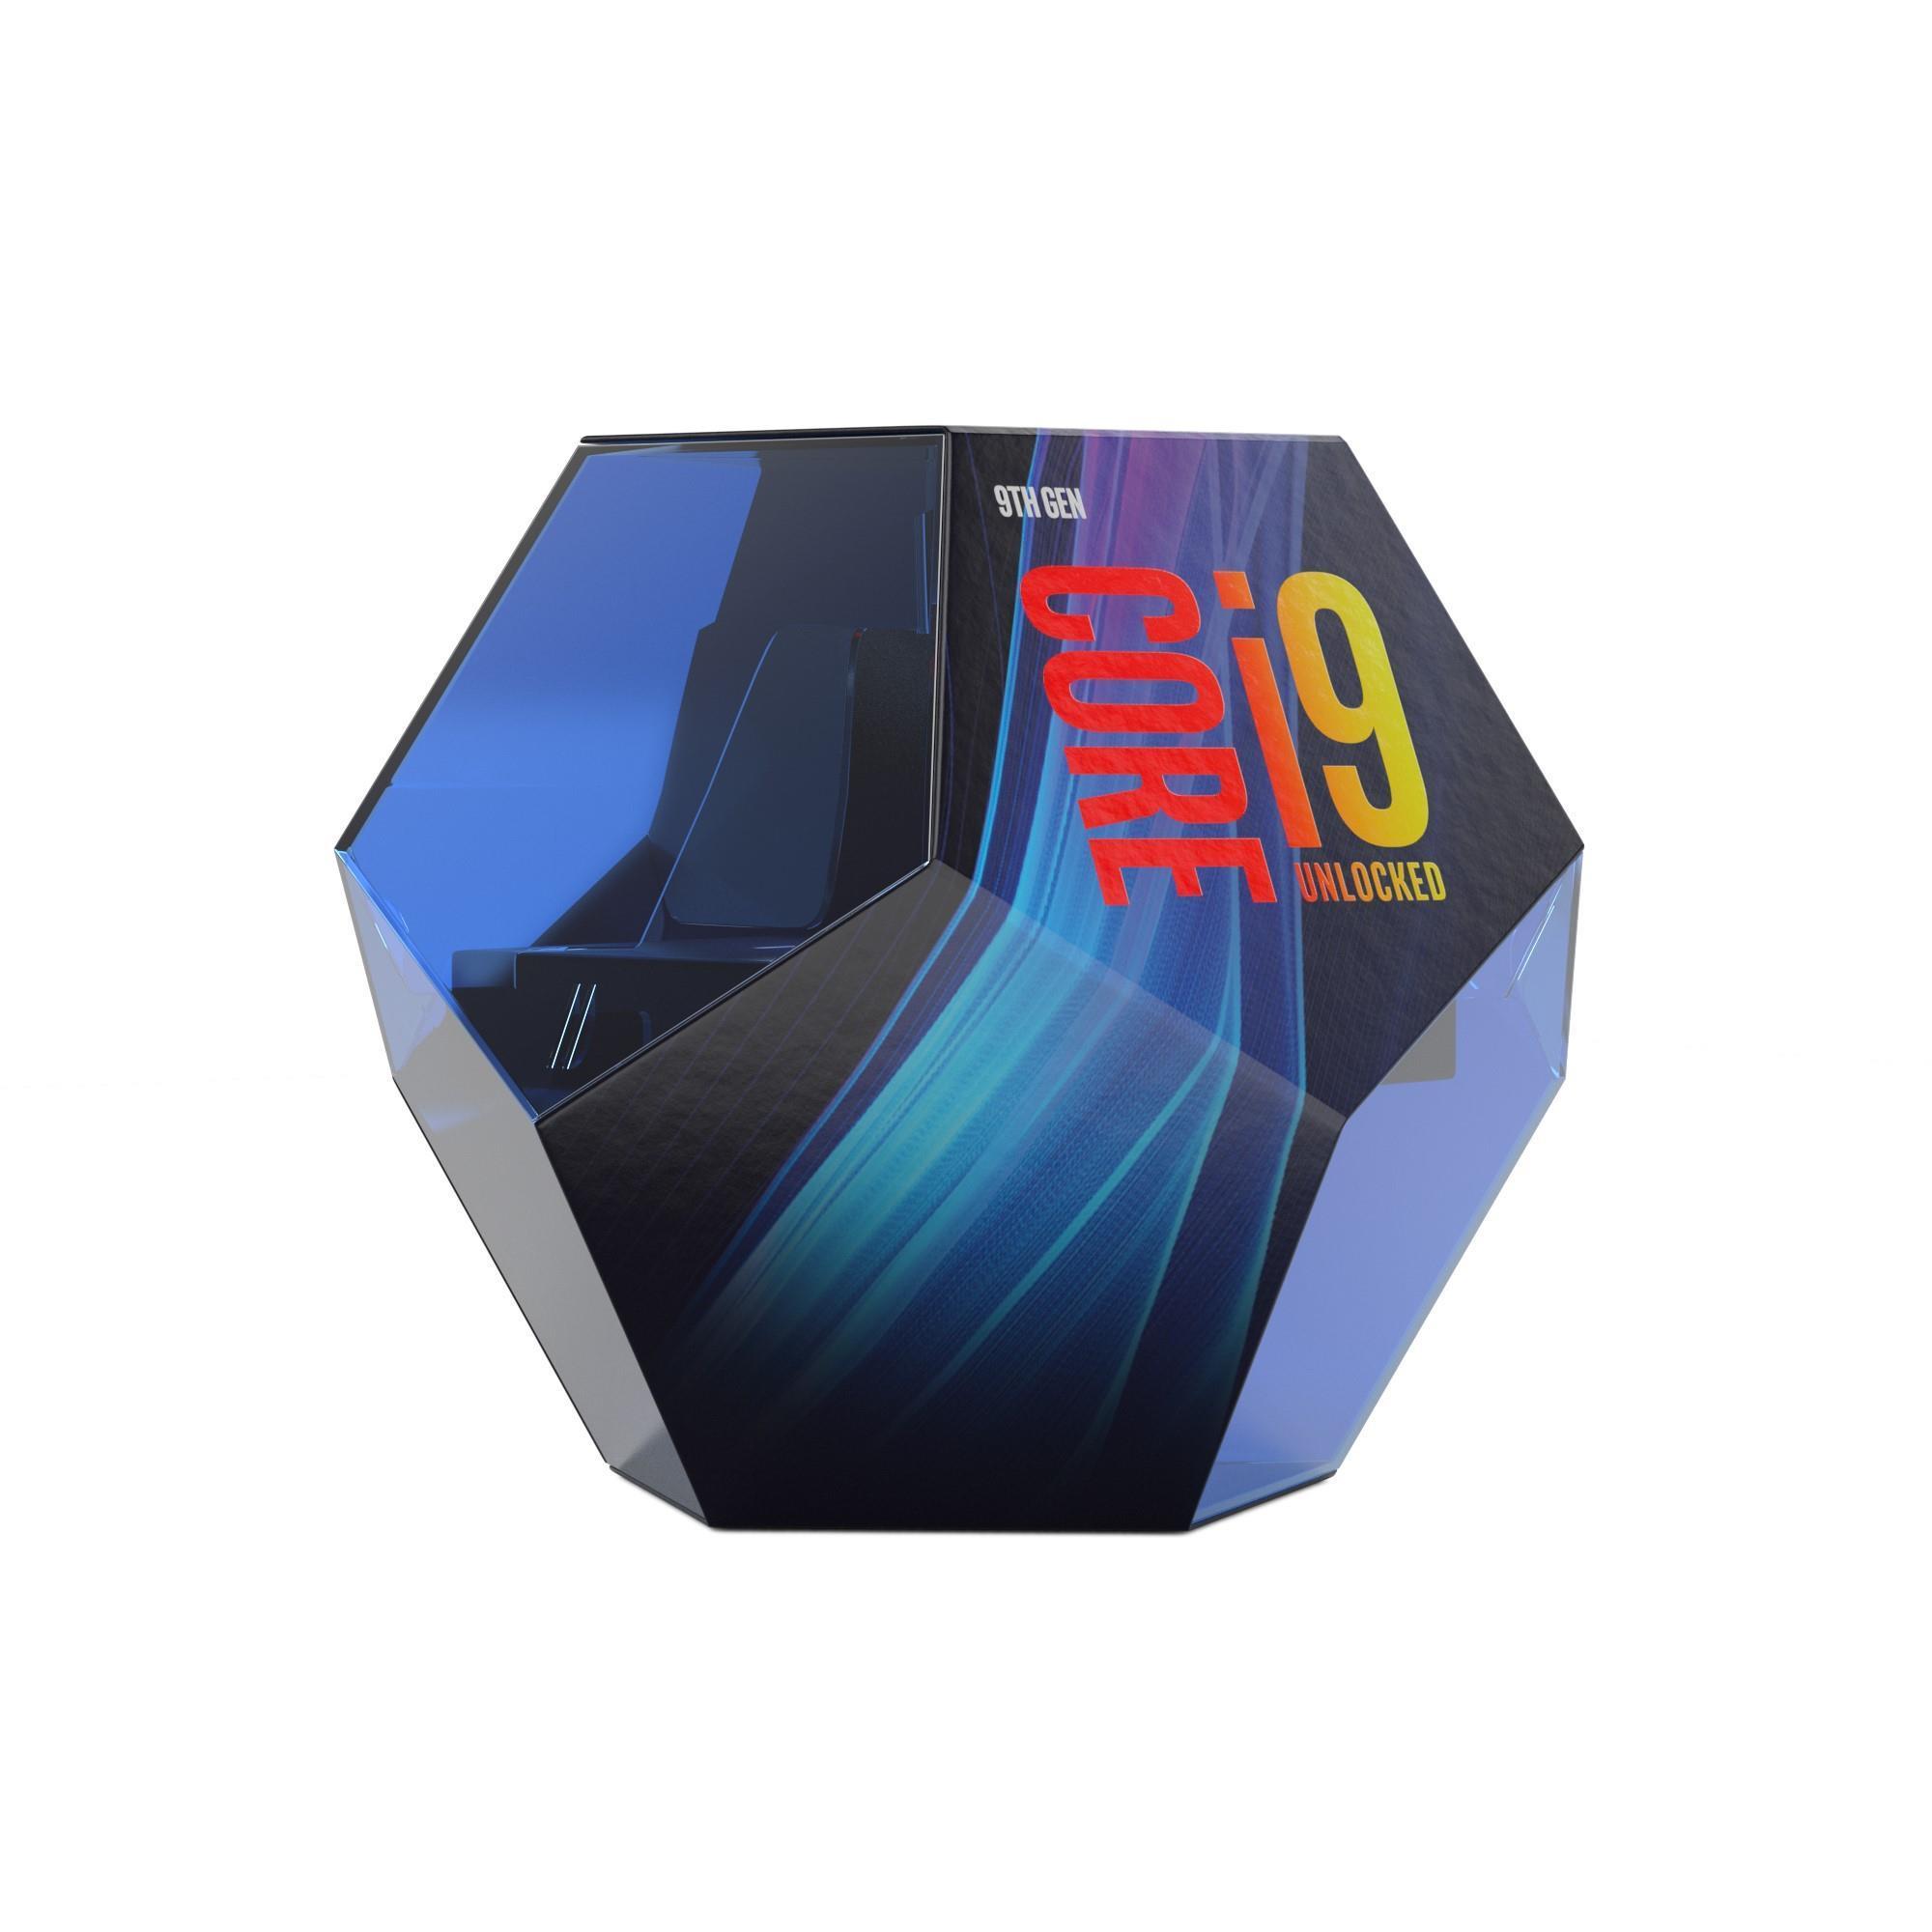 intel core i9 9900 processor